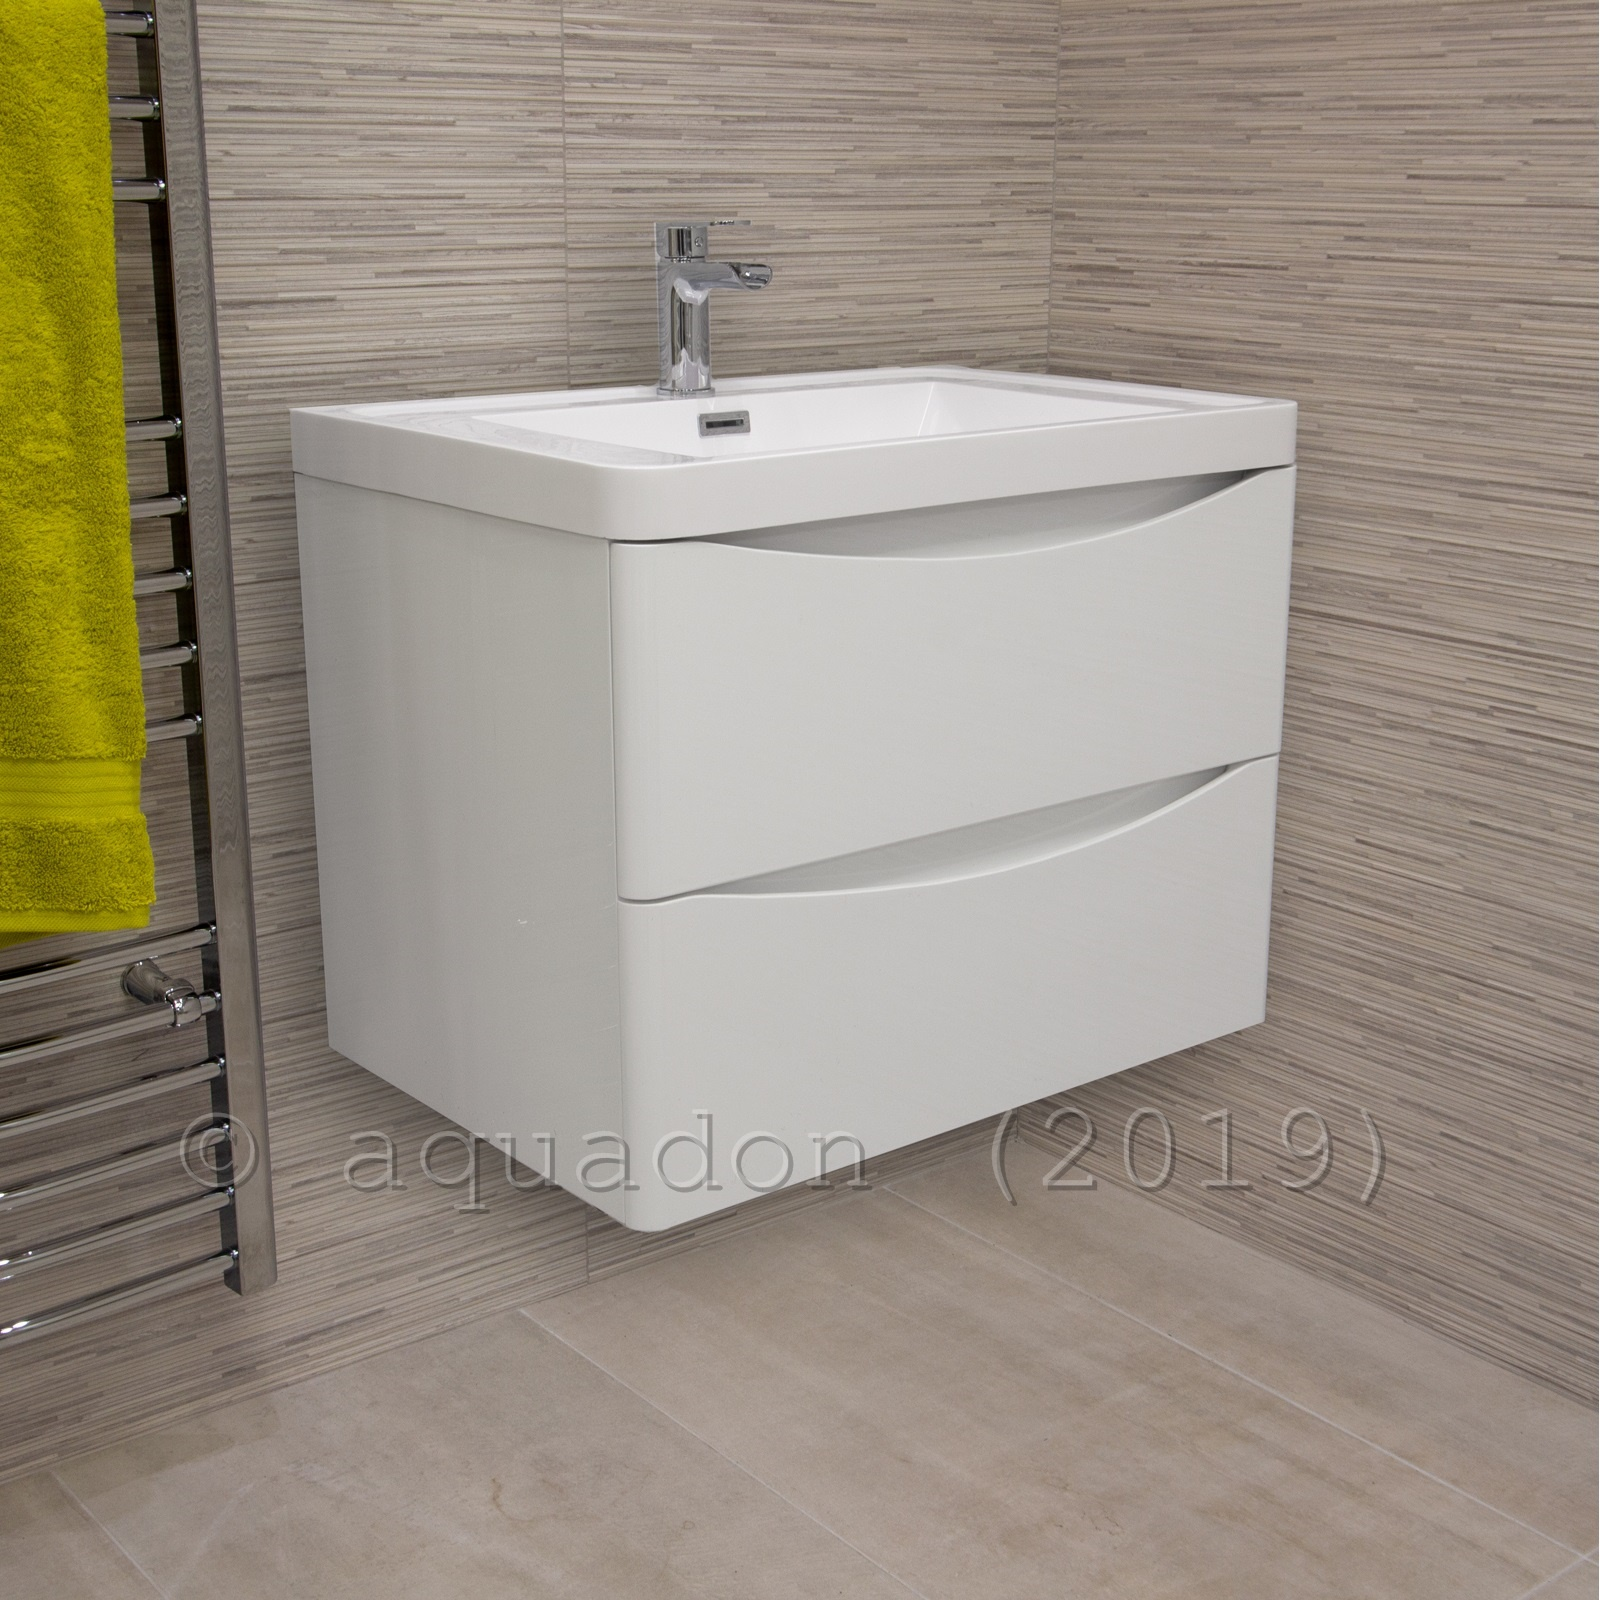 Bathroom Vanity Unit Modern Basin Sink Unit 2 Drawer Storage Cabinets Ebay